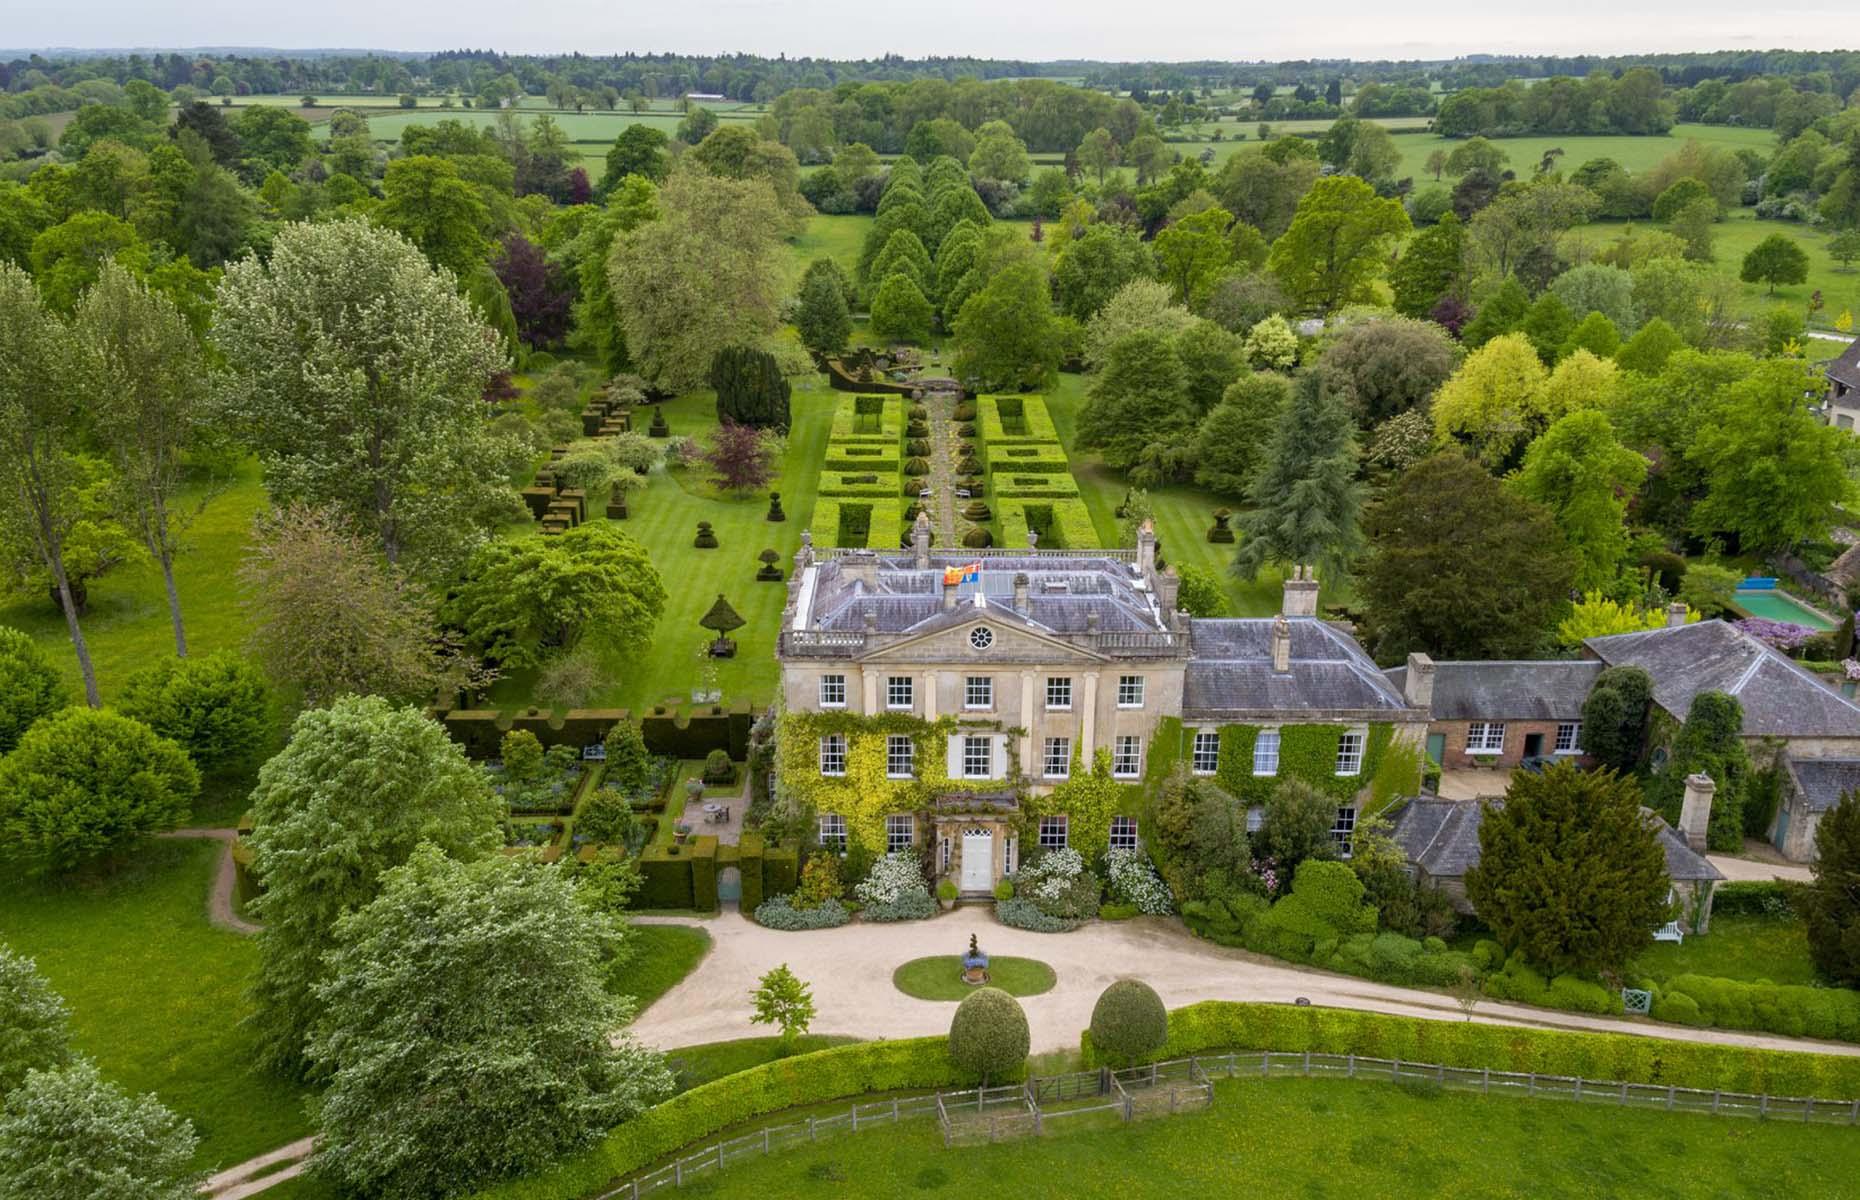 Highgrove House and the Royal Gardens